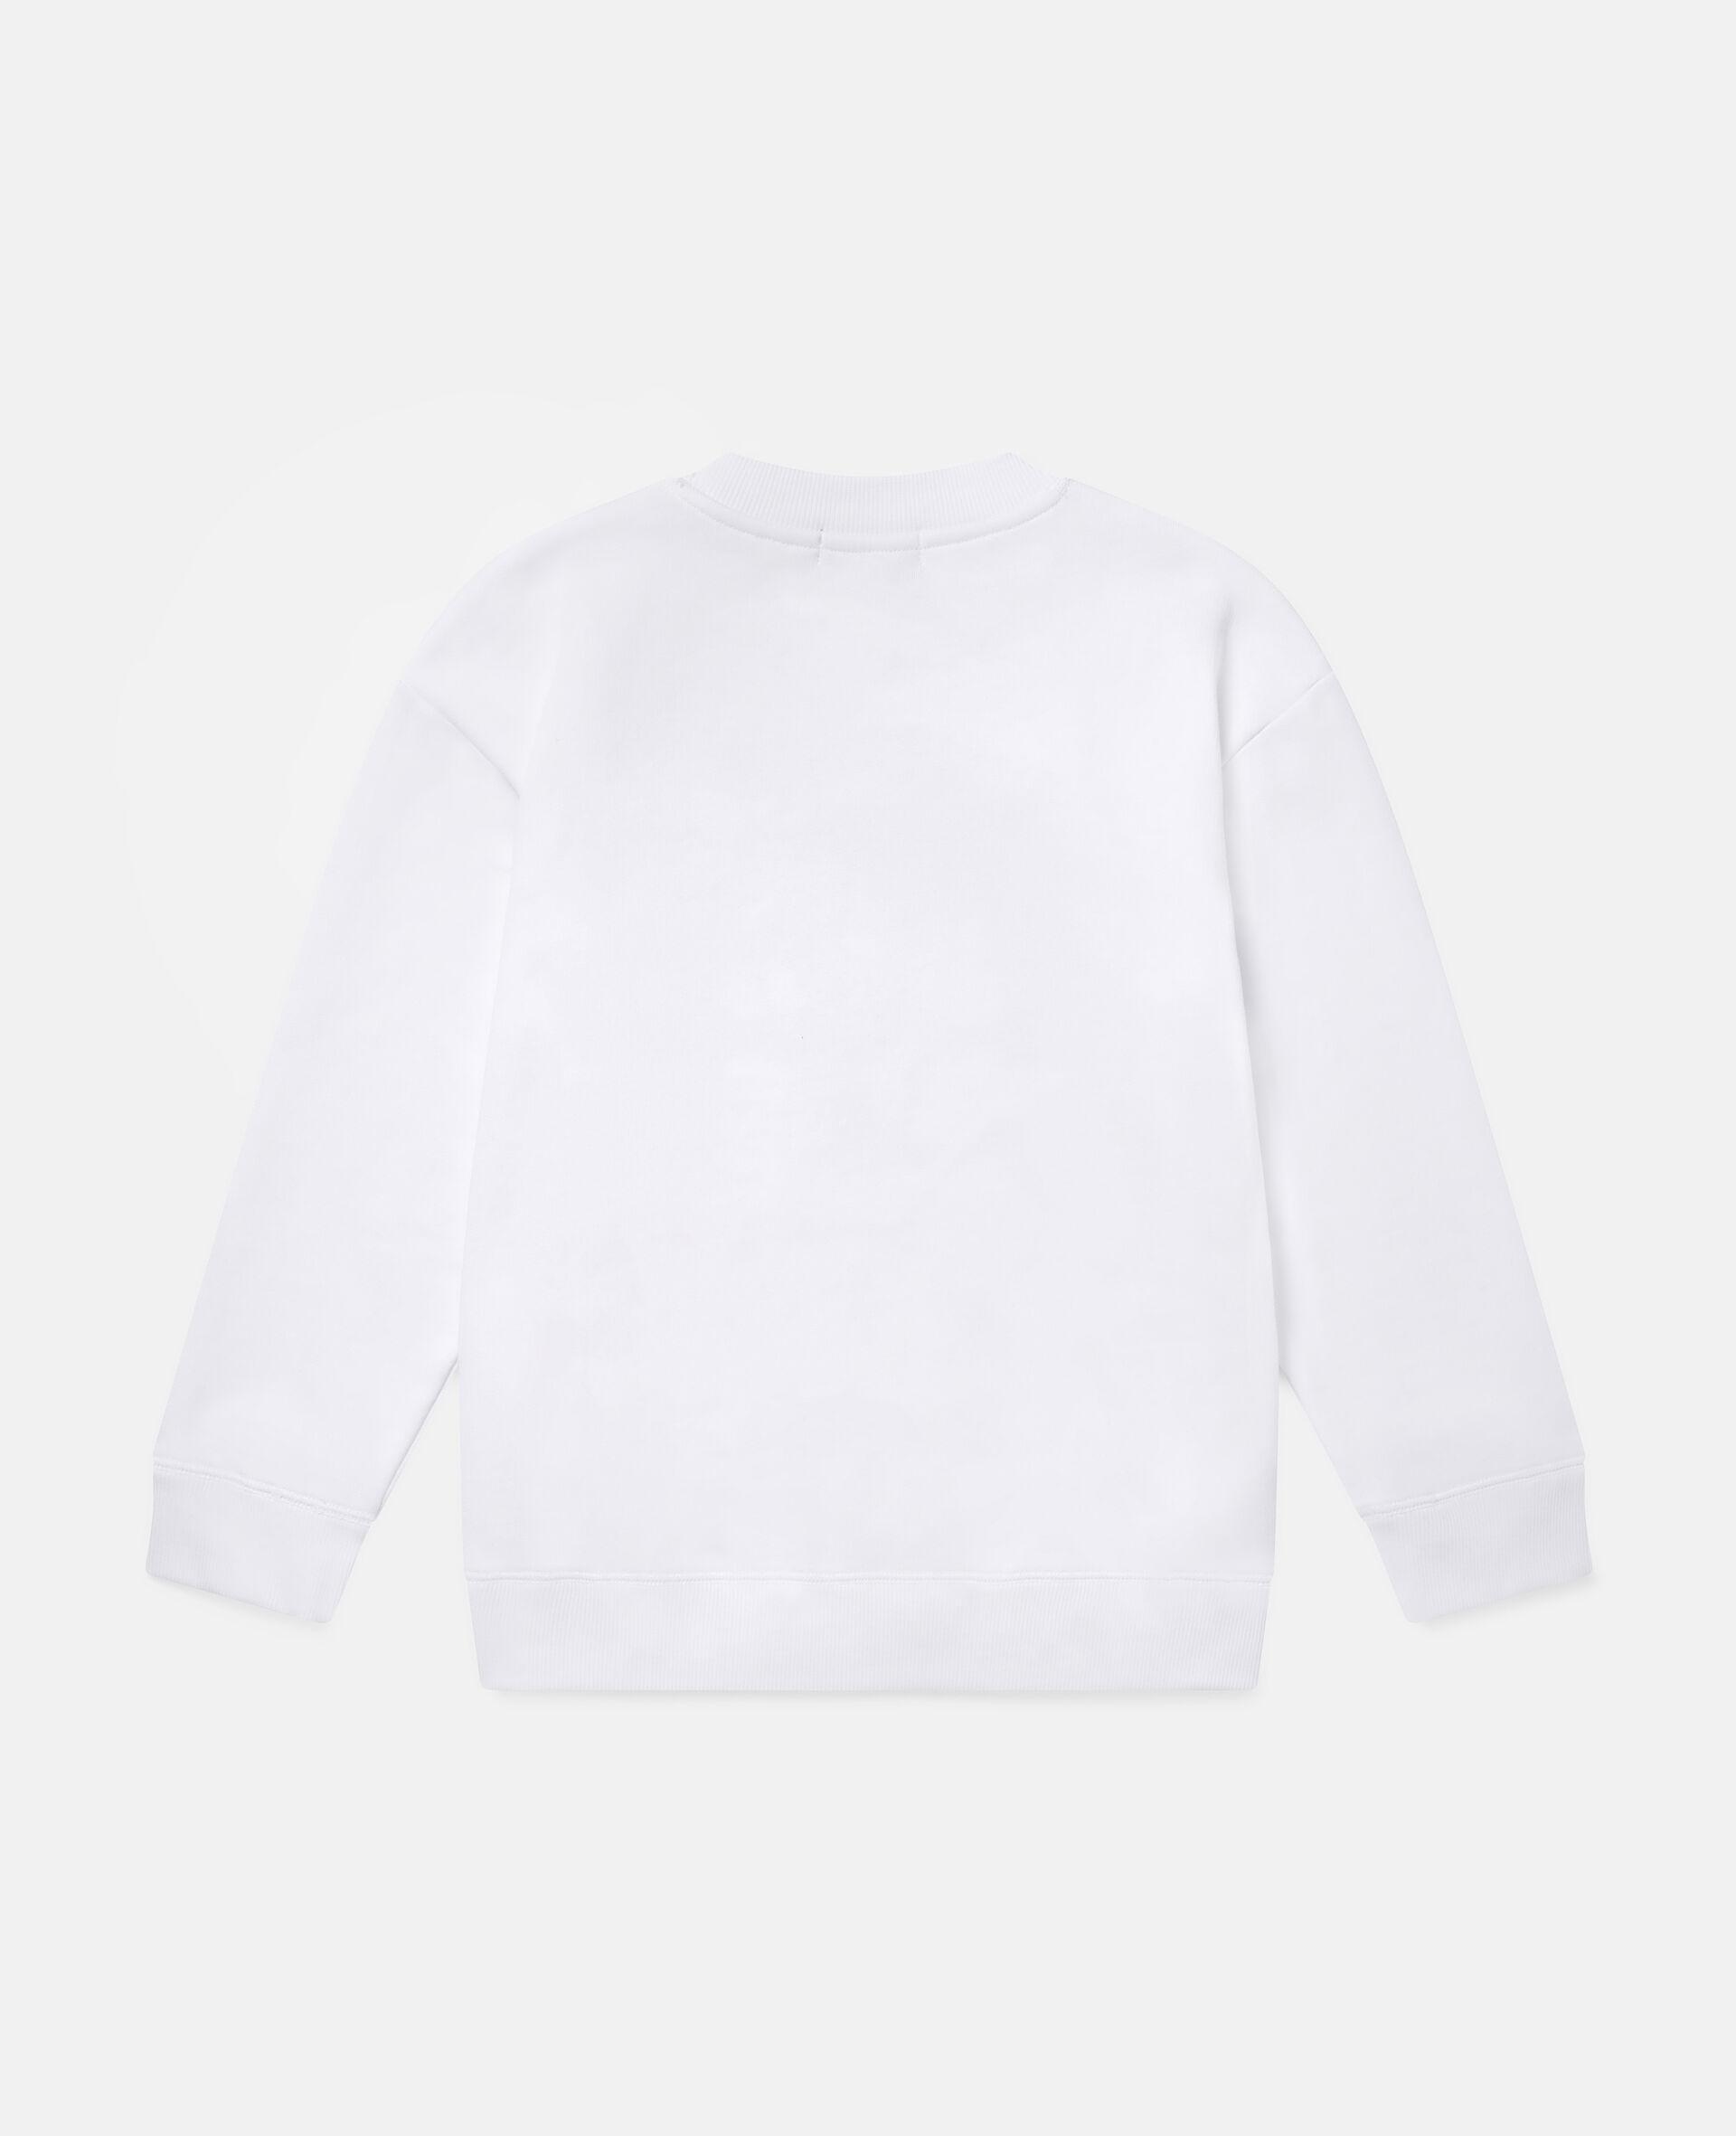 Fleece-Sweatshirt mit Pizza-Skater-Motiv-Weiß-large image number 3